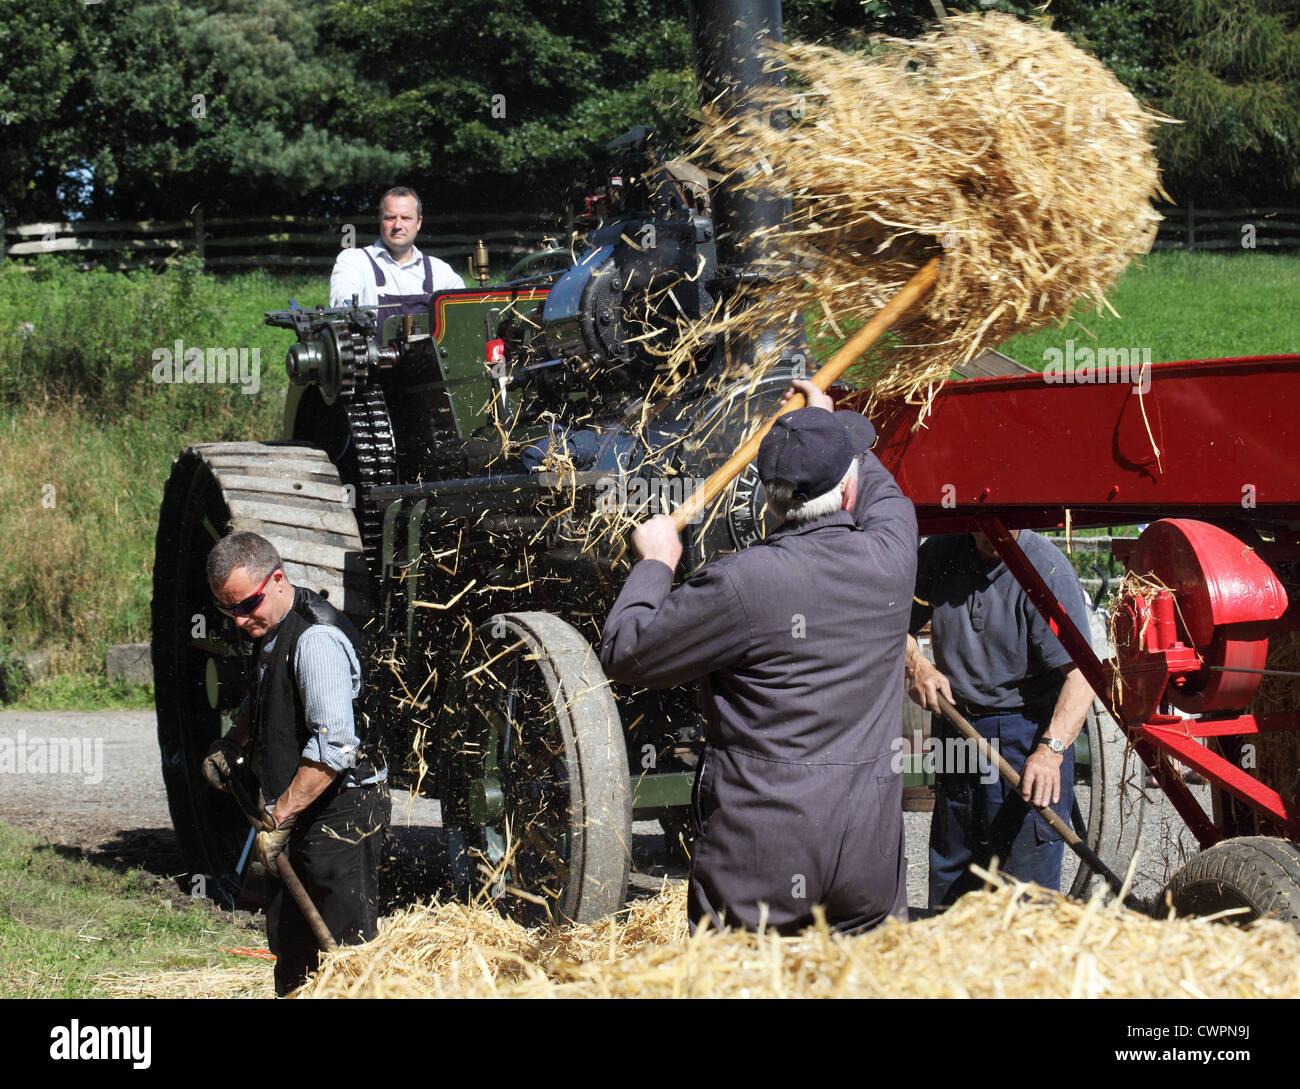 men-loading-hay-into-steam-powered-balin